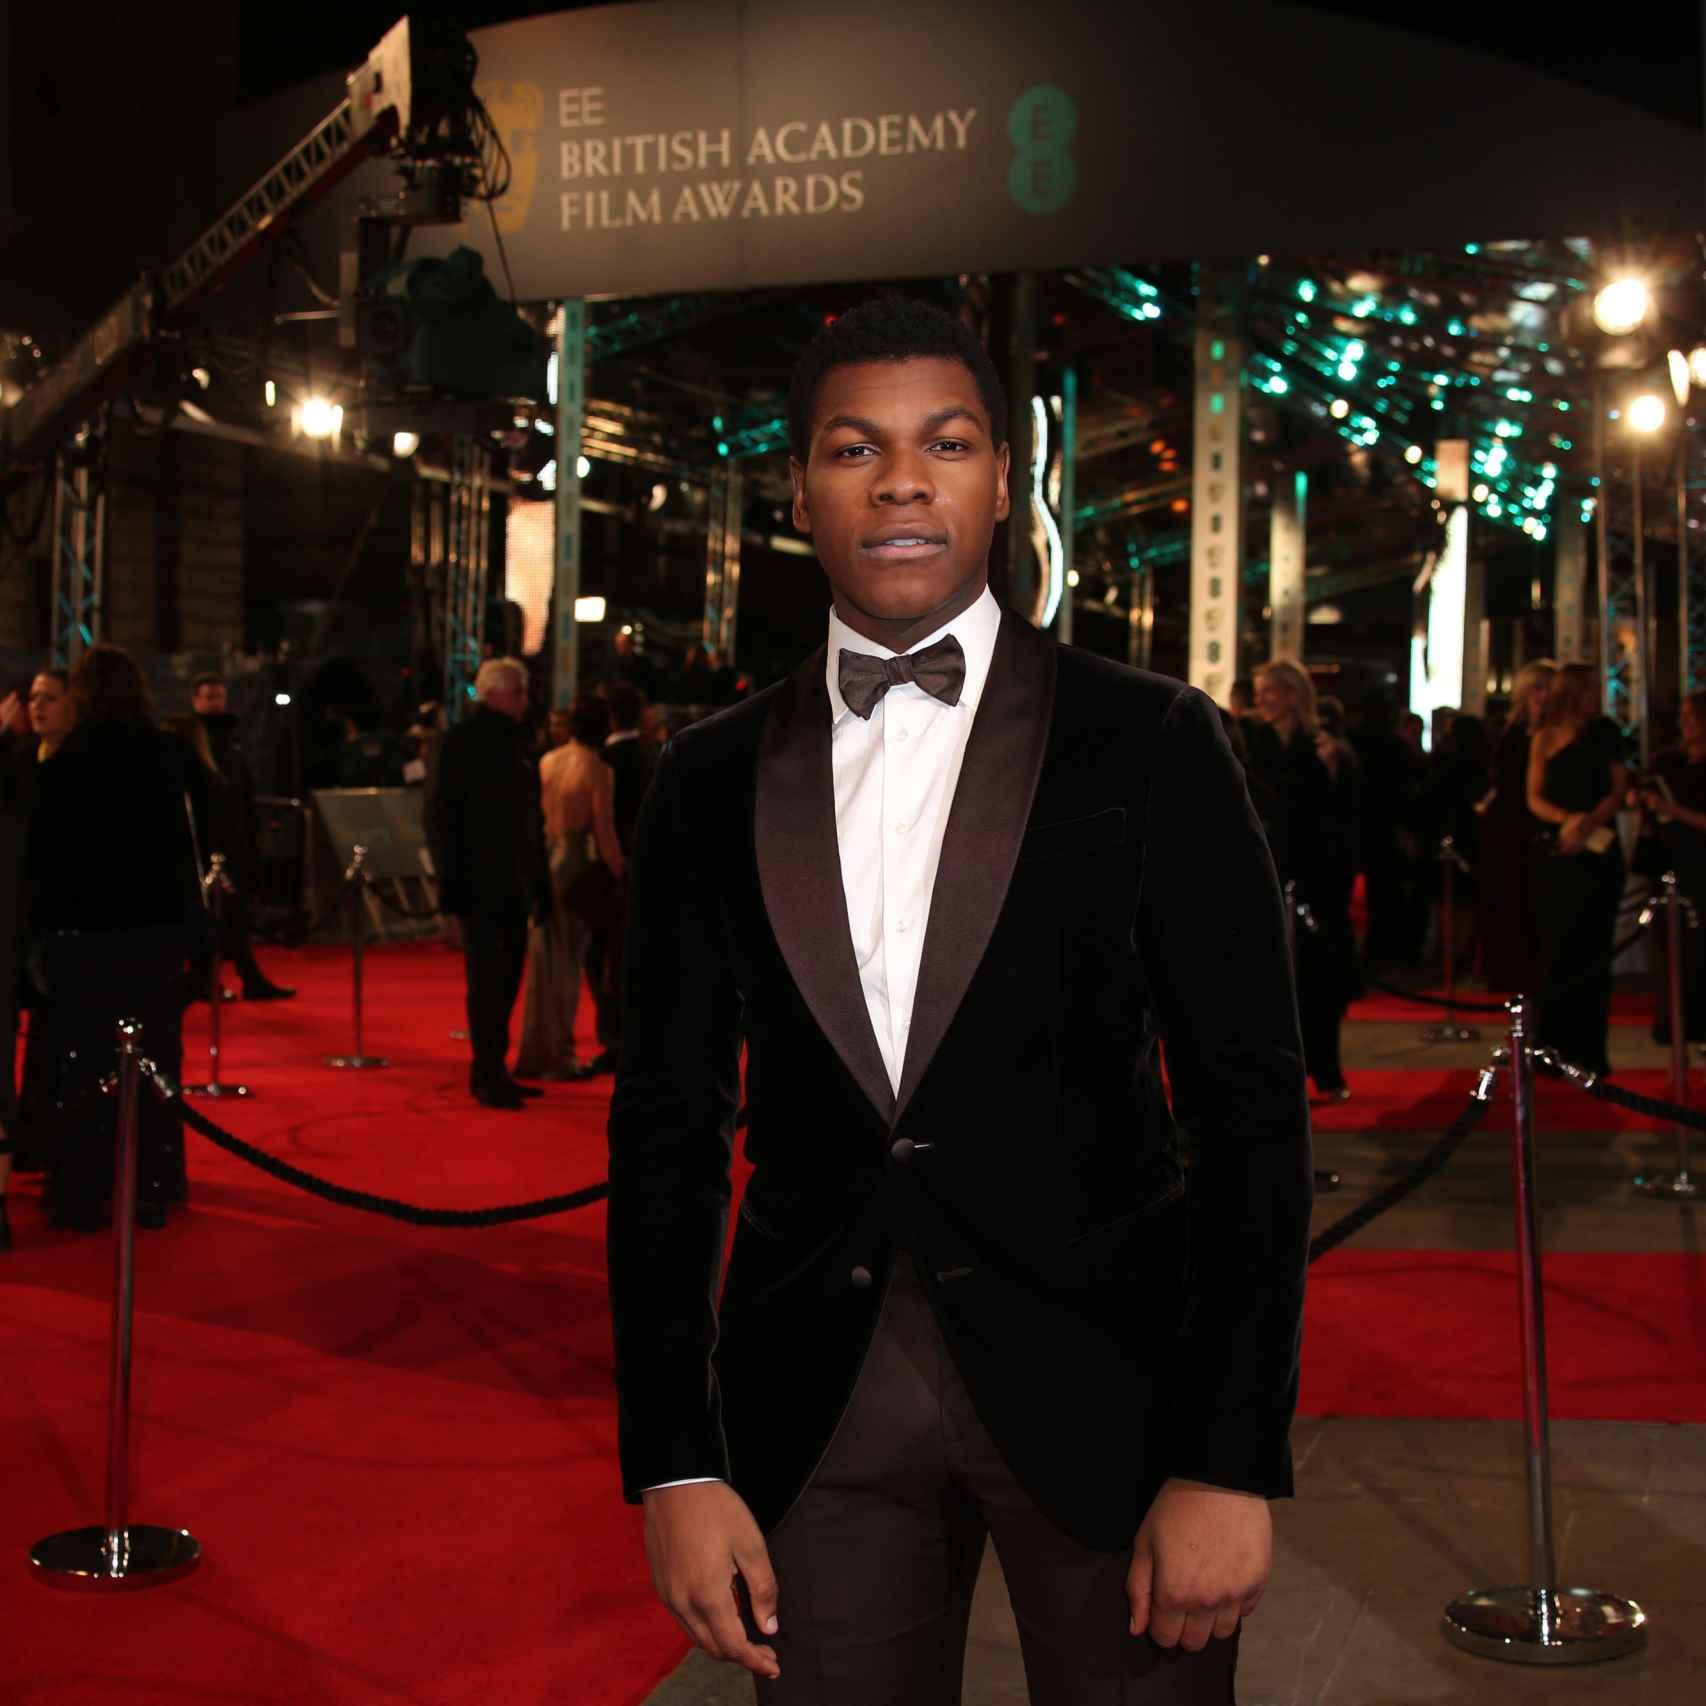 John Boyega en la alfombra roja de los premios Bafta 2016